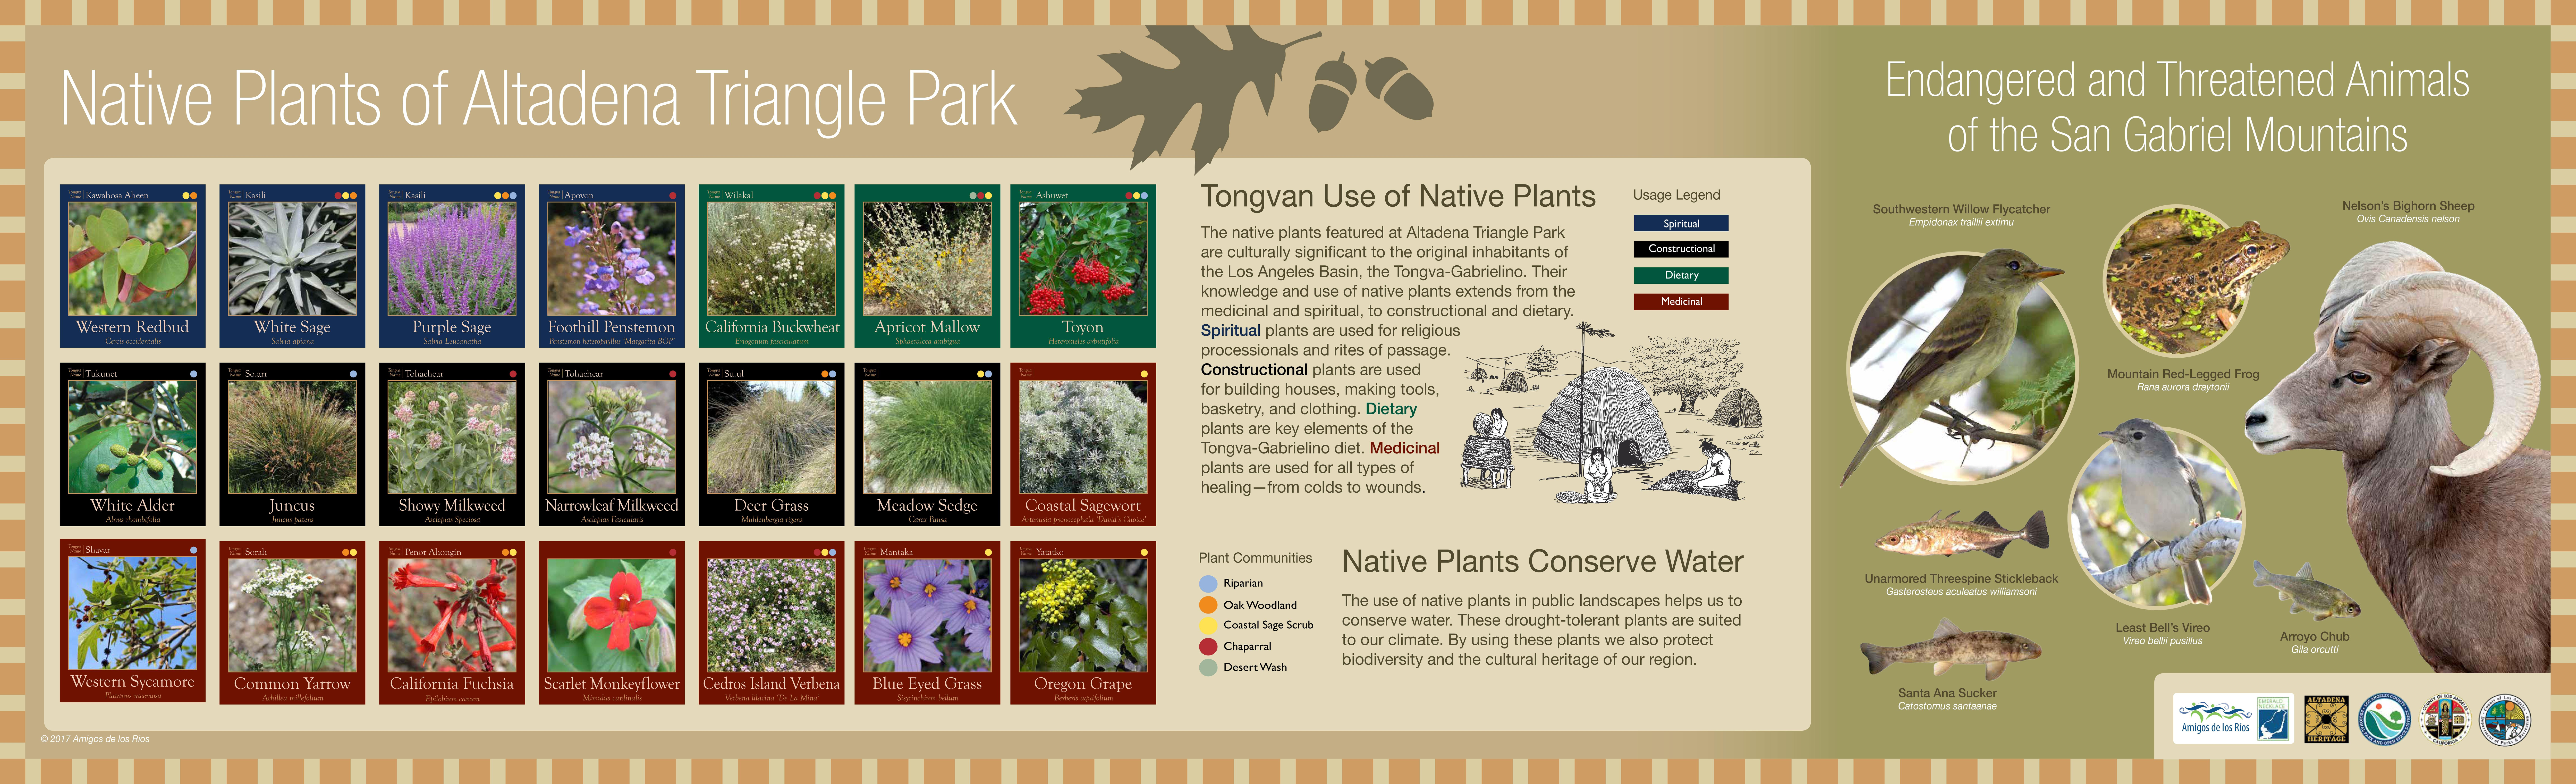 Altadena-Triangle-Park-Information